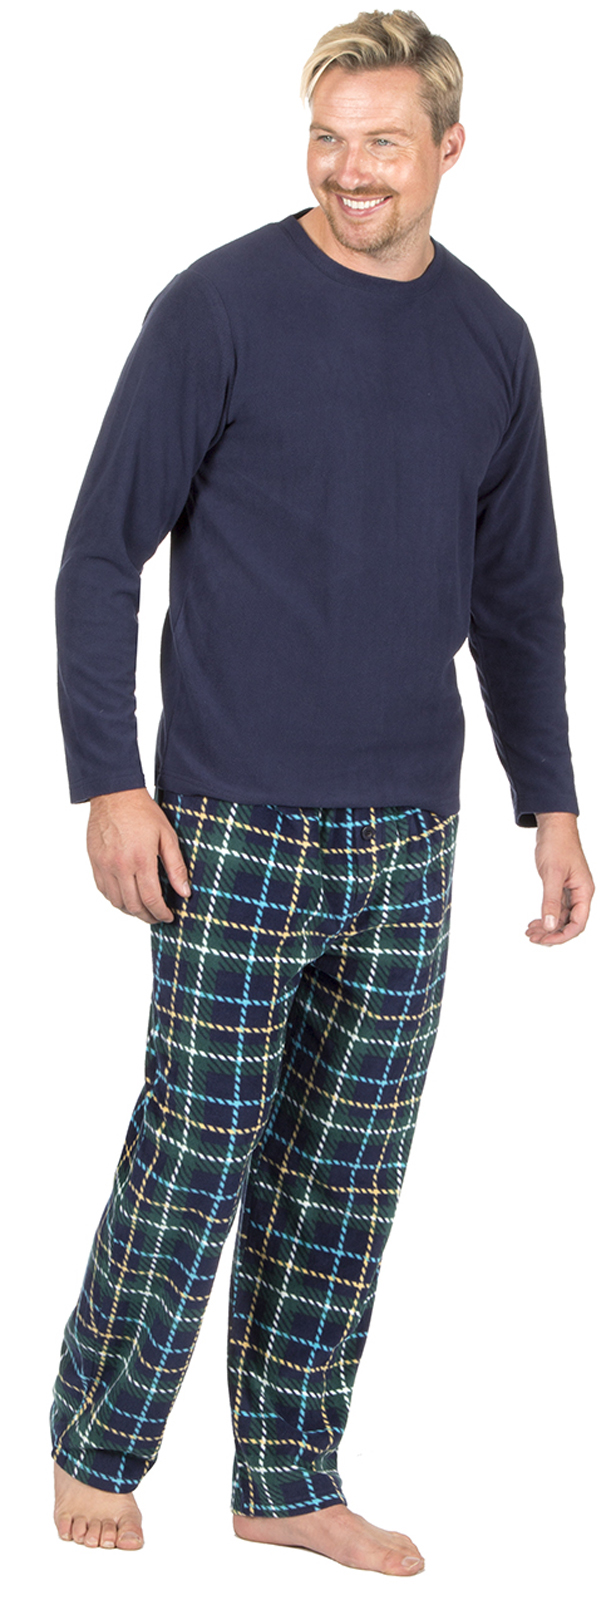 Crew Neck Grandad 100/% cotton Kaboo Trading Original design more Cols available